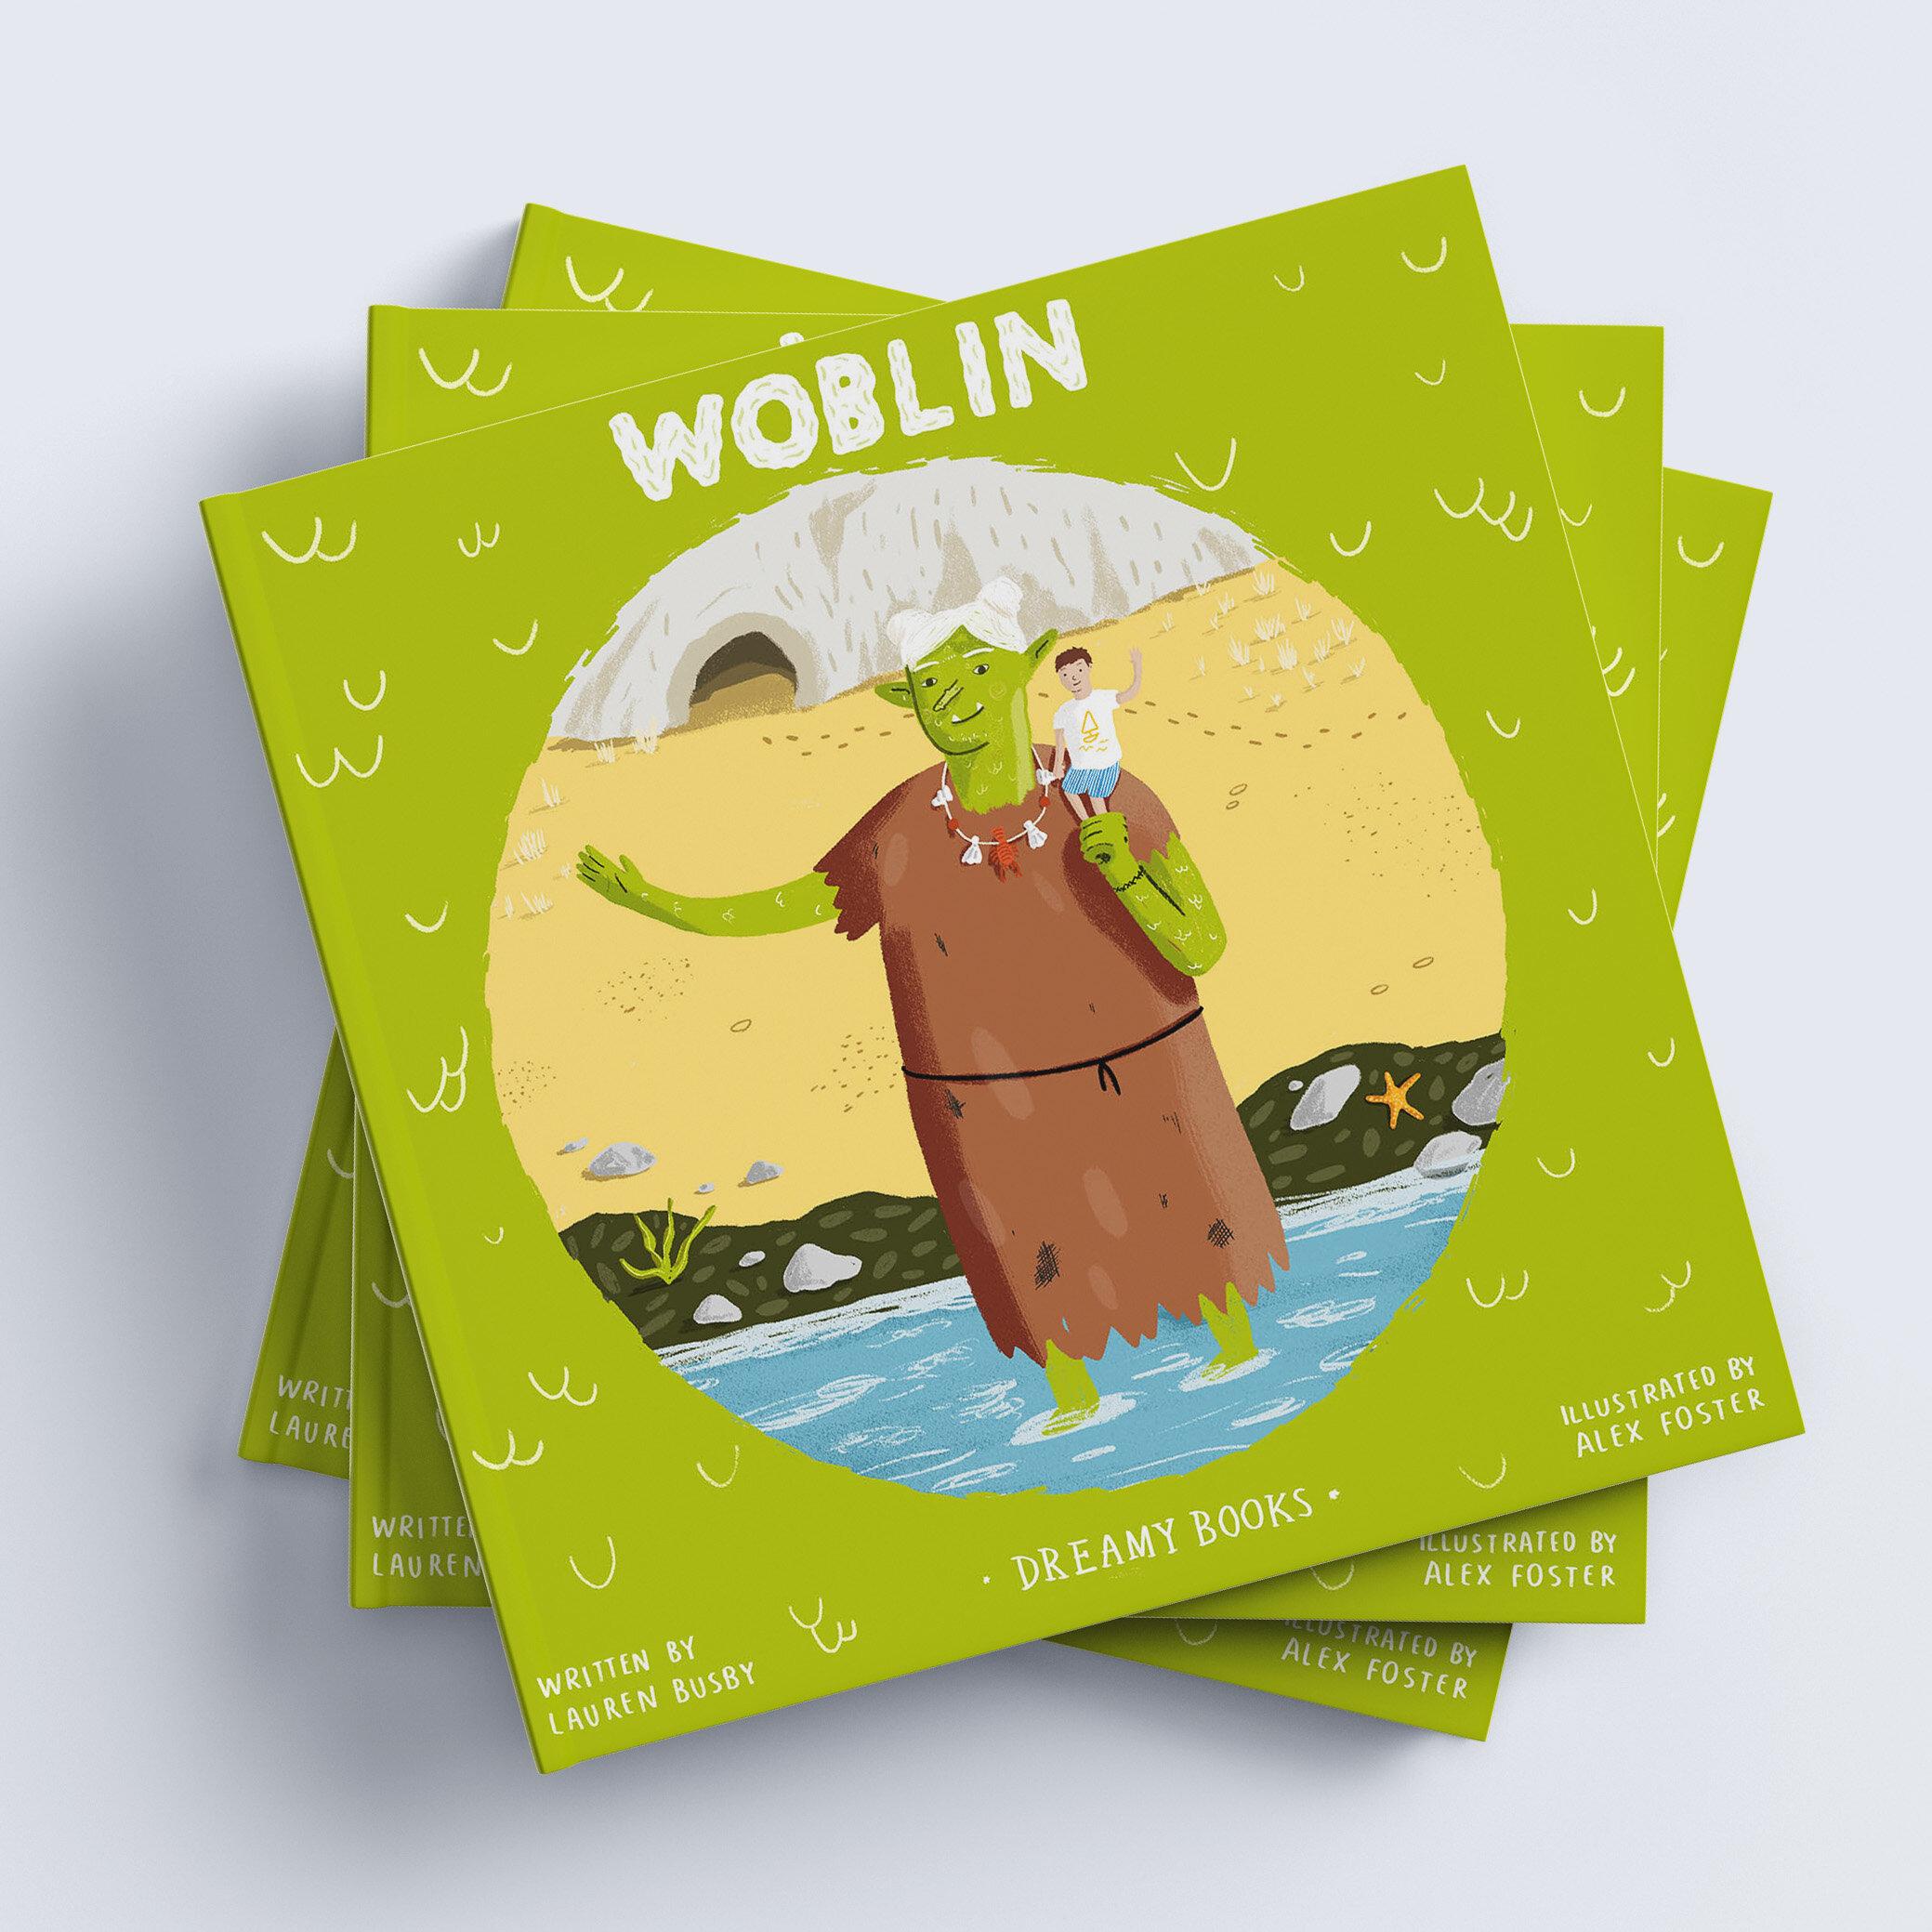 Woblin book cover 3.jpg